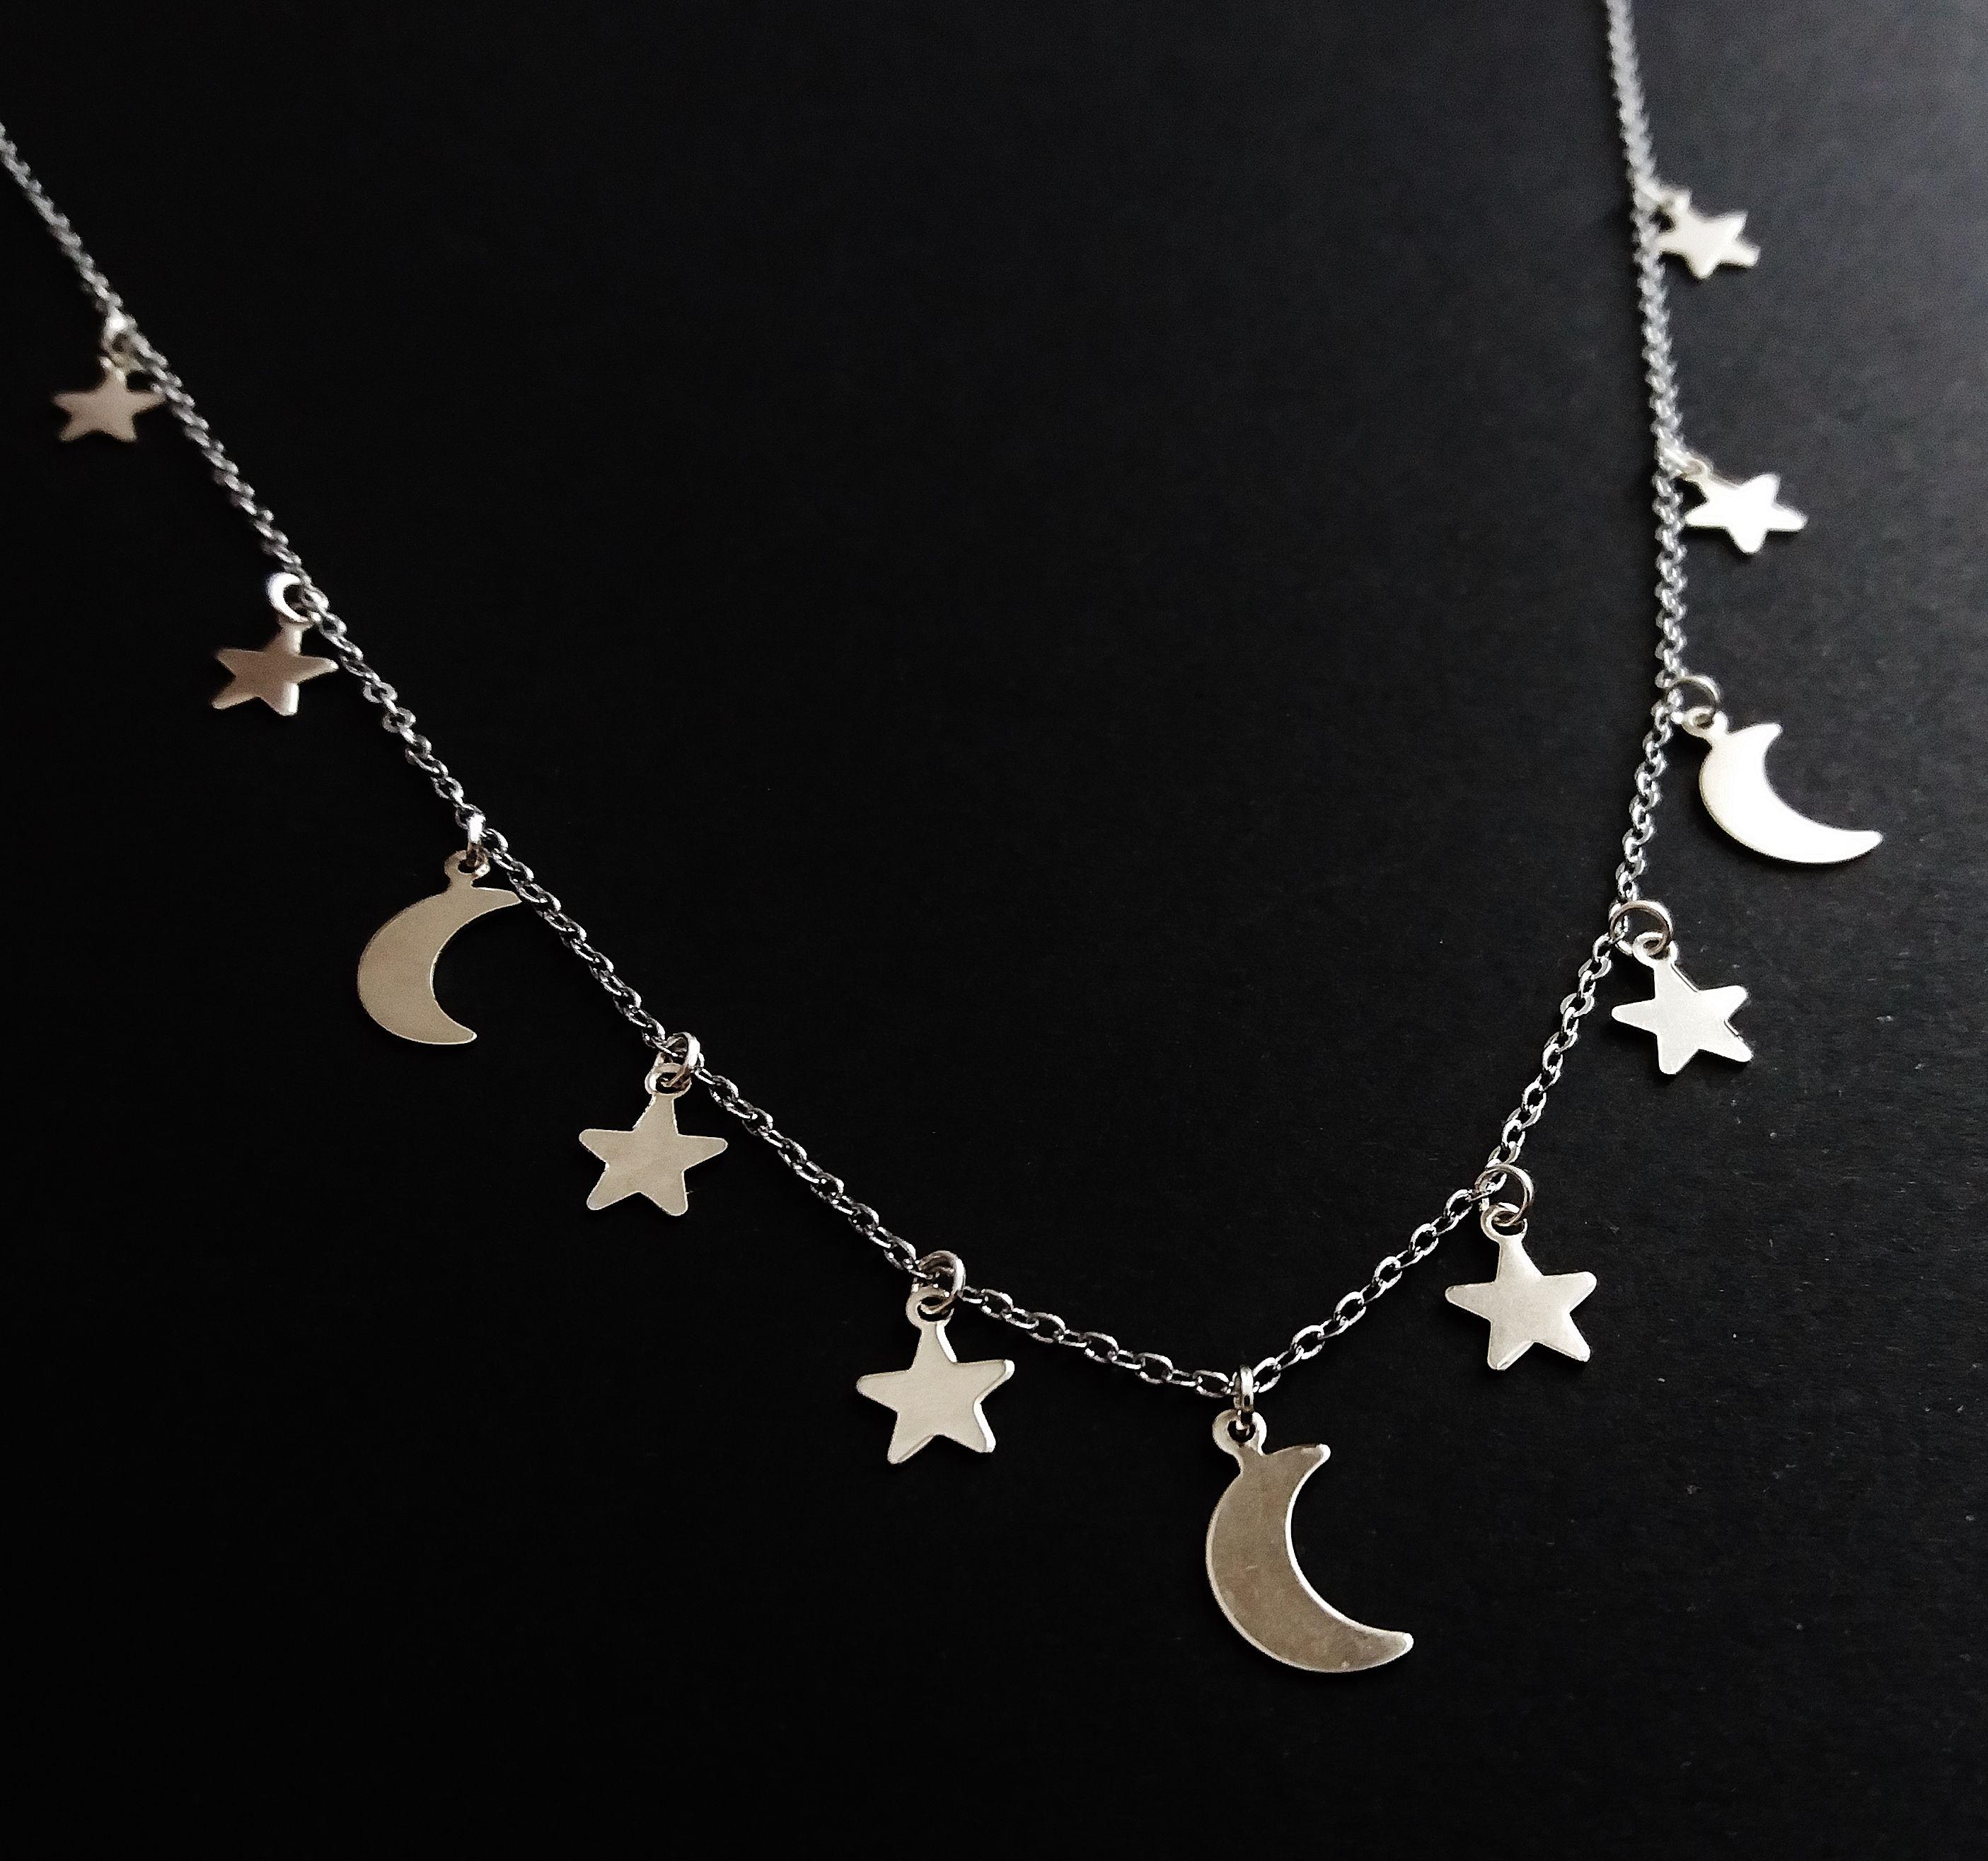 Moon and stars necklace ofstarsandwine on etsy boho grunge moon and stars necklace ofstarsandwine on etsy boho grunge handmade jewelry aloadofball Gallery